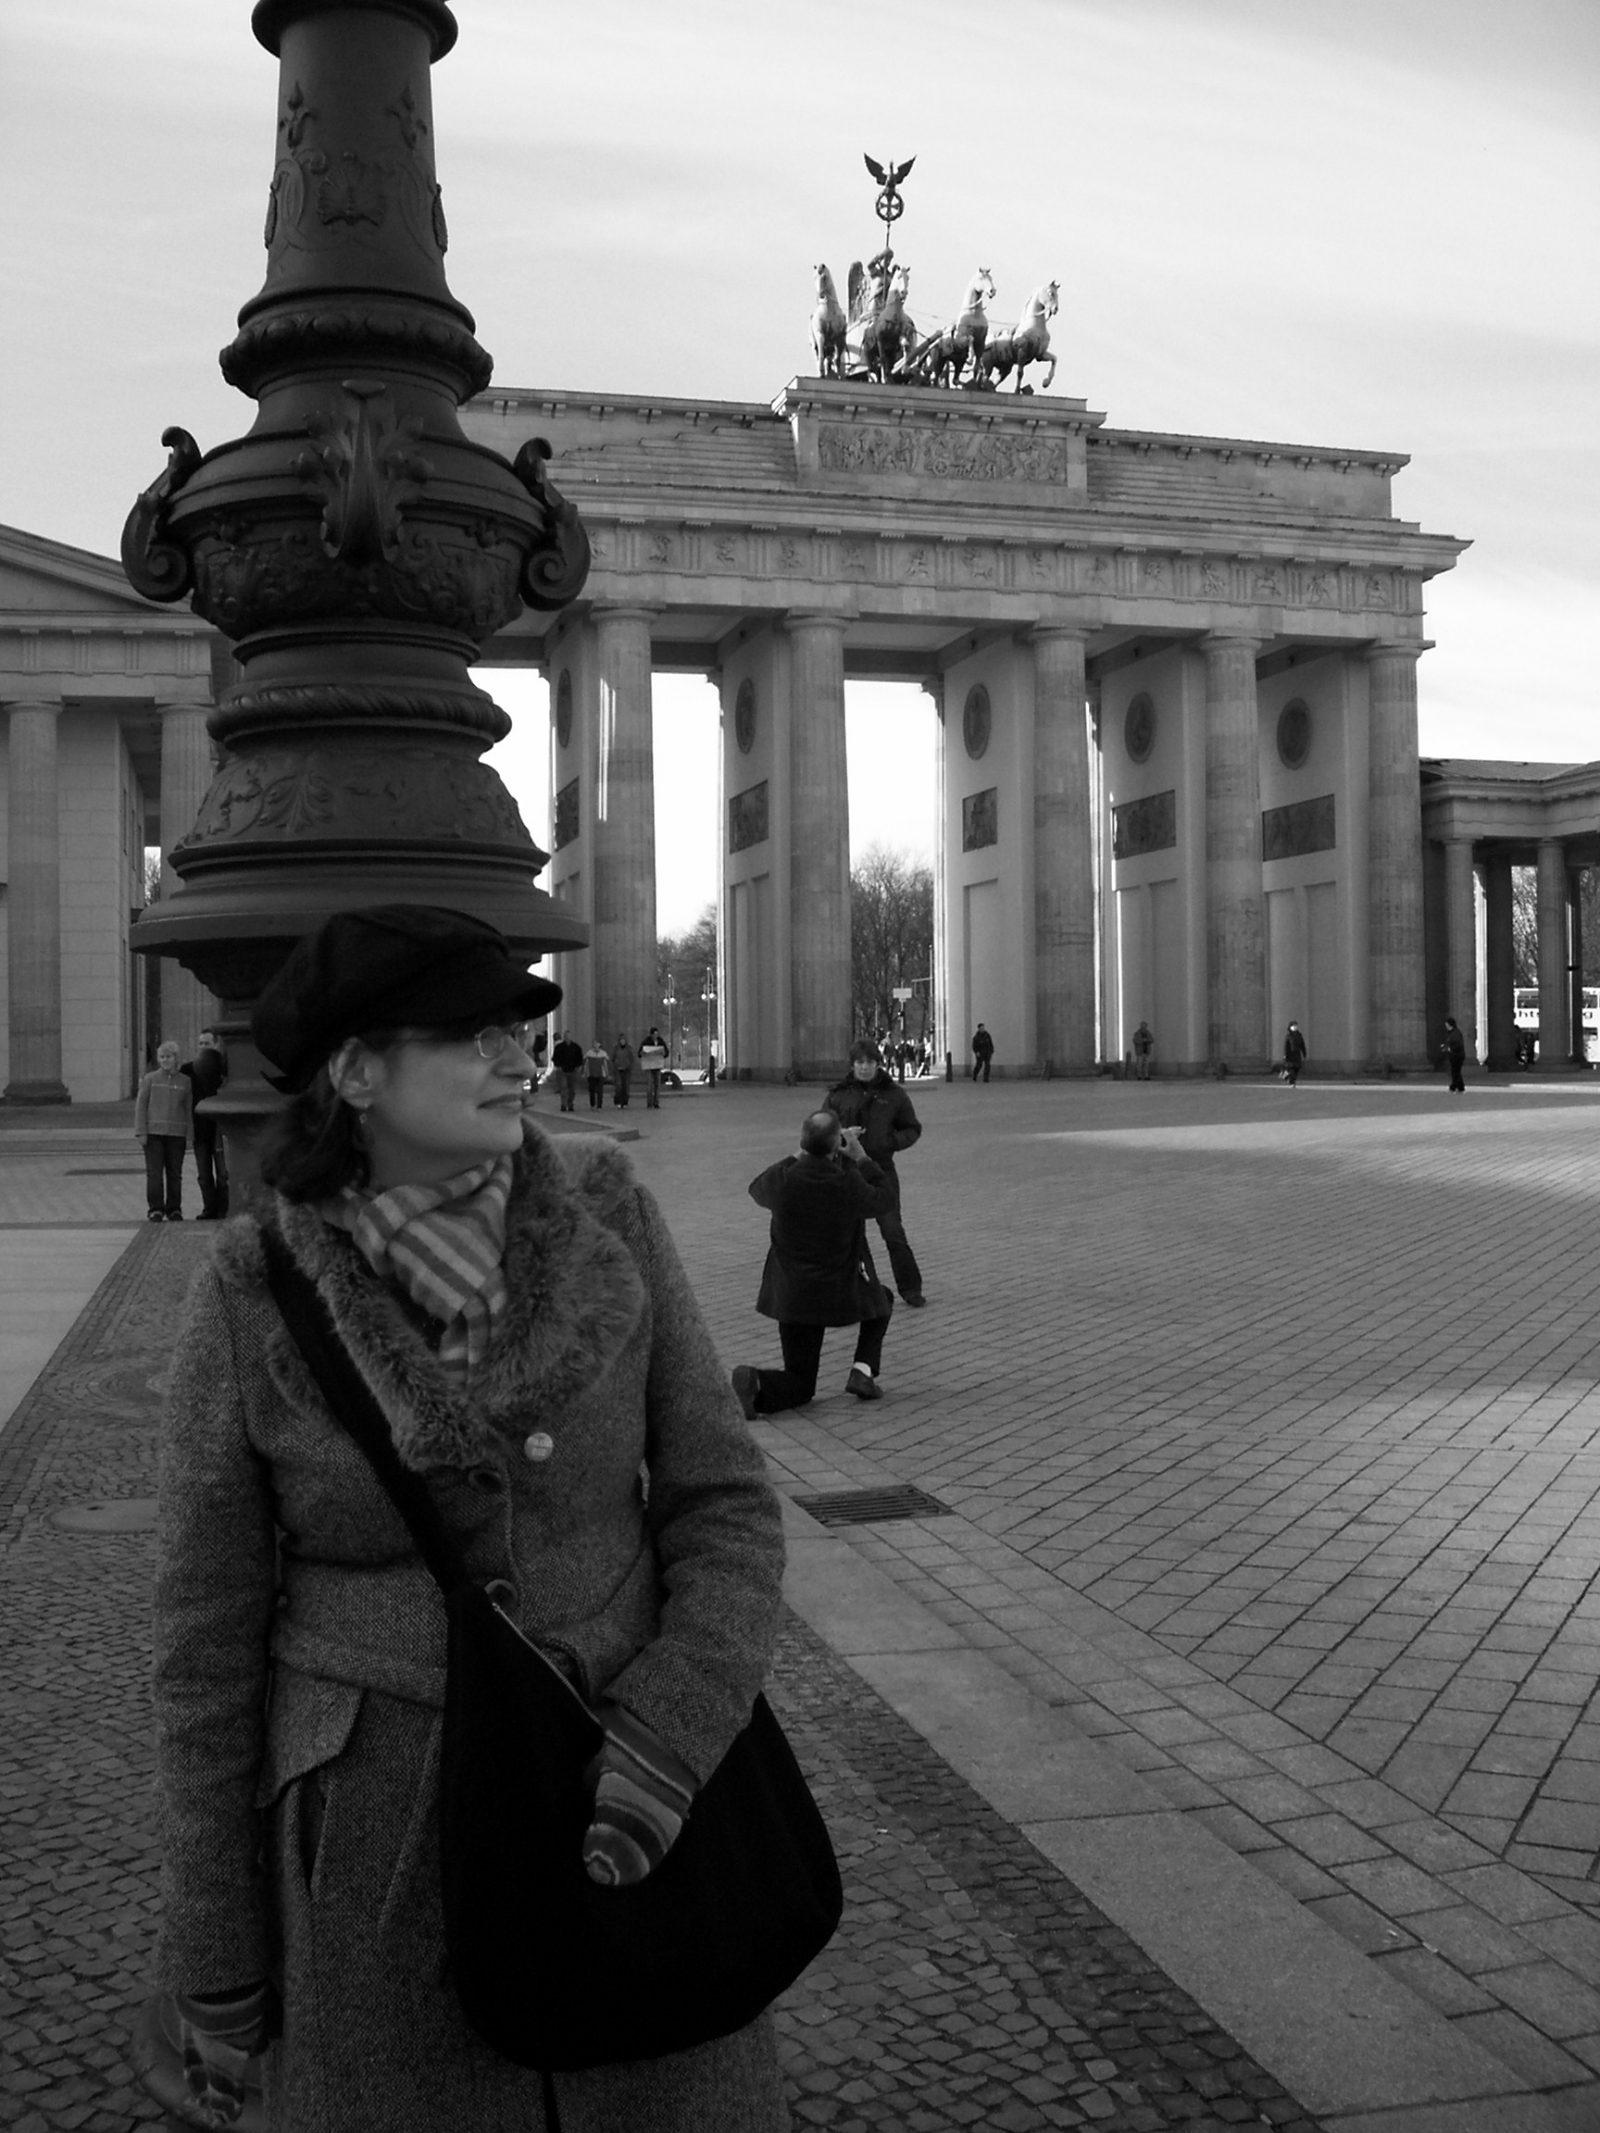 Lis by the Brandenburg Gate